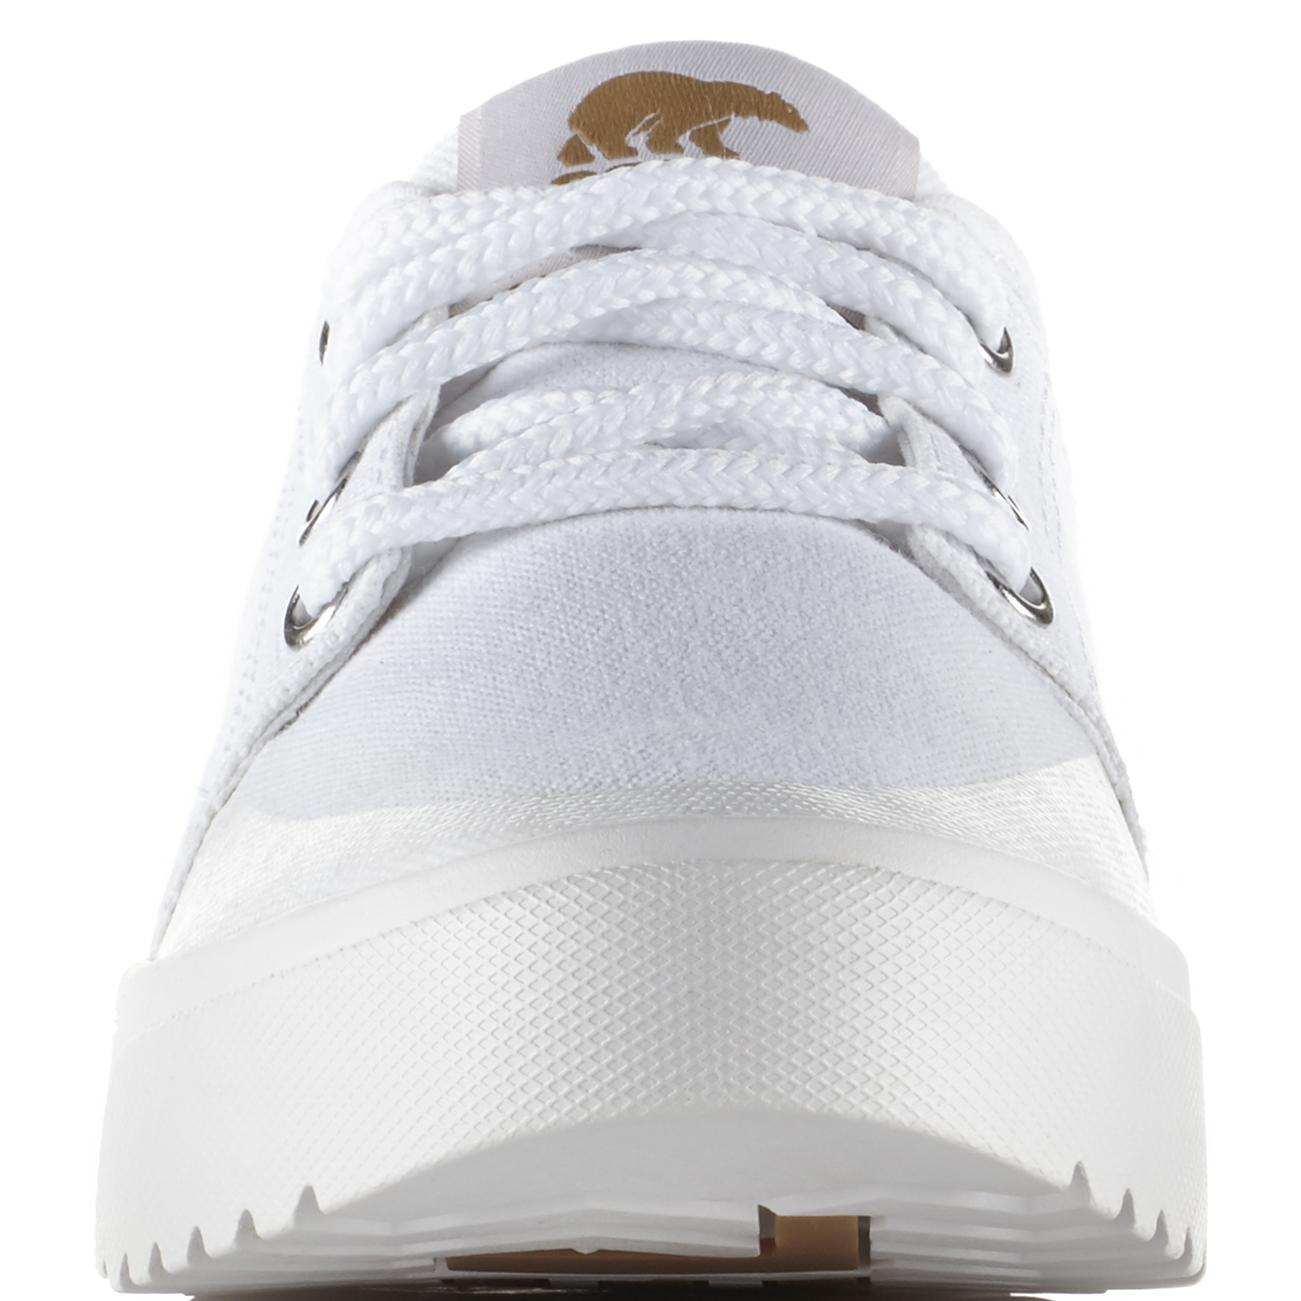 Damenschuhe Sorel Campsneak Campsneak Sorel Lace Walking Niedrig Top Canvas Casual Hiking Sneaker US 5-11 f88105